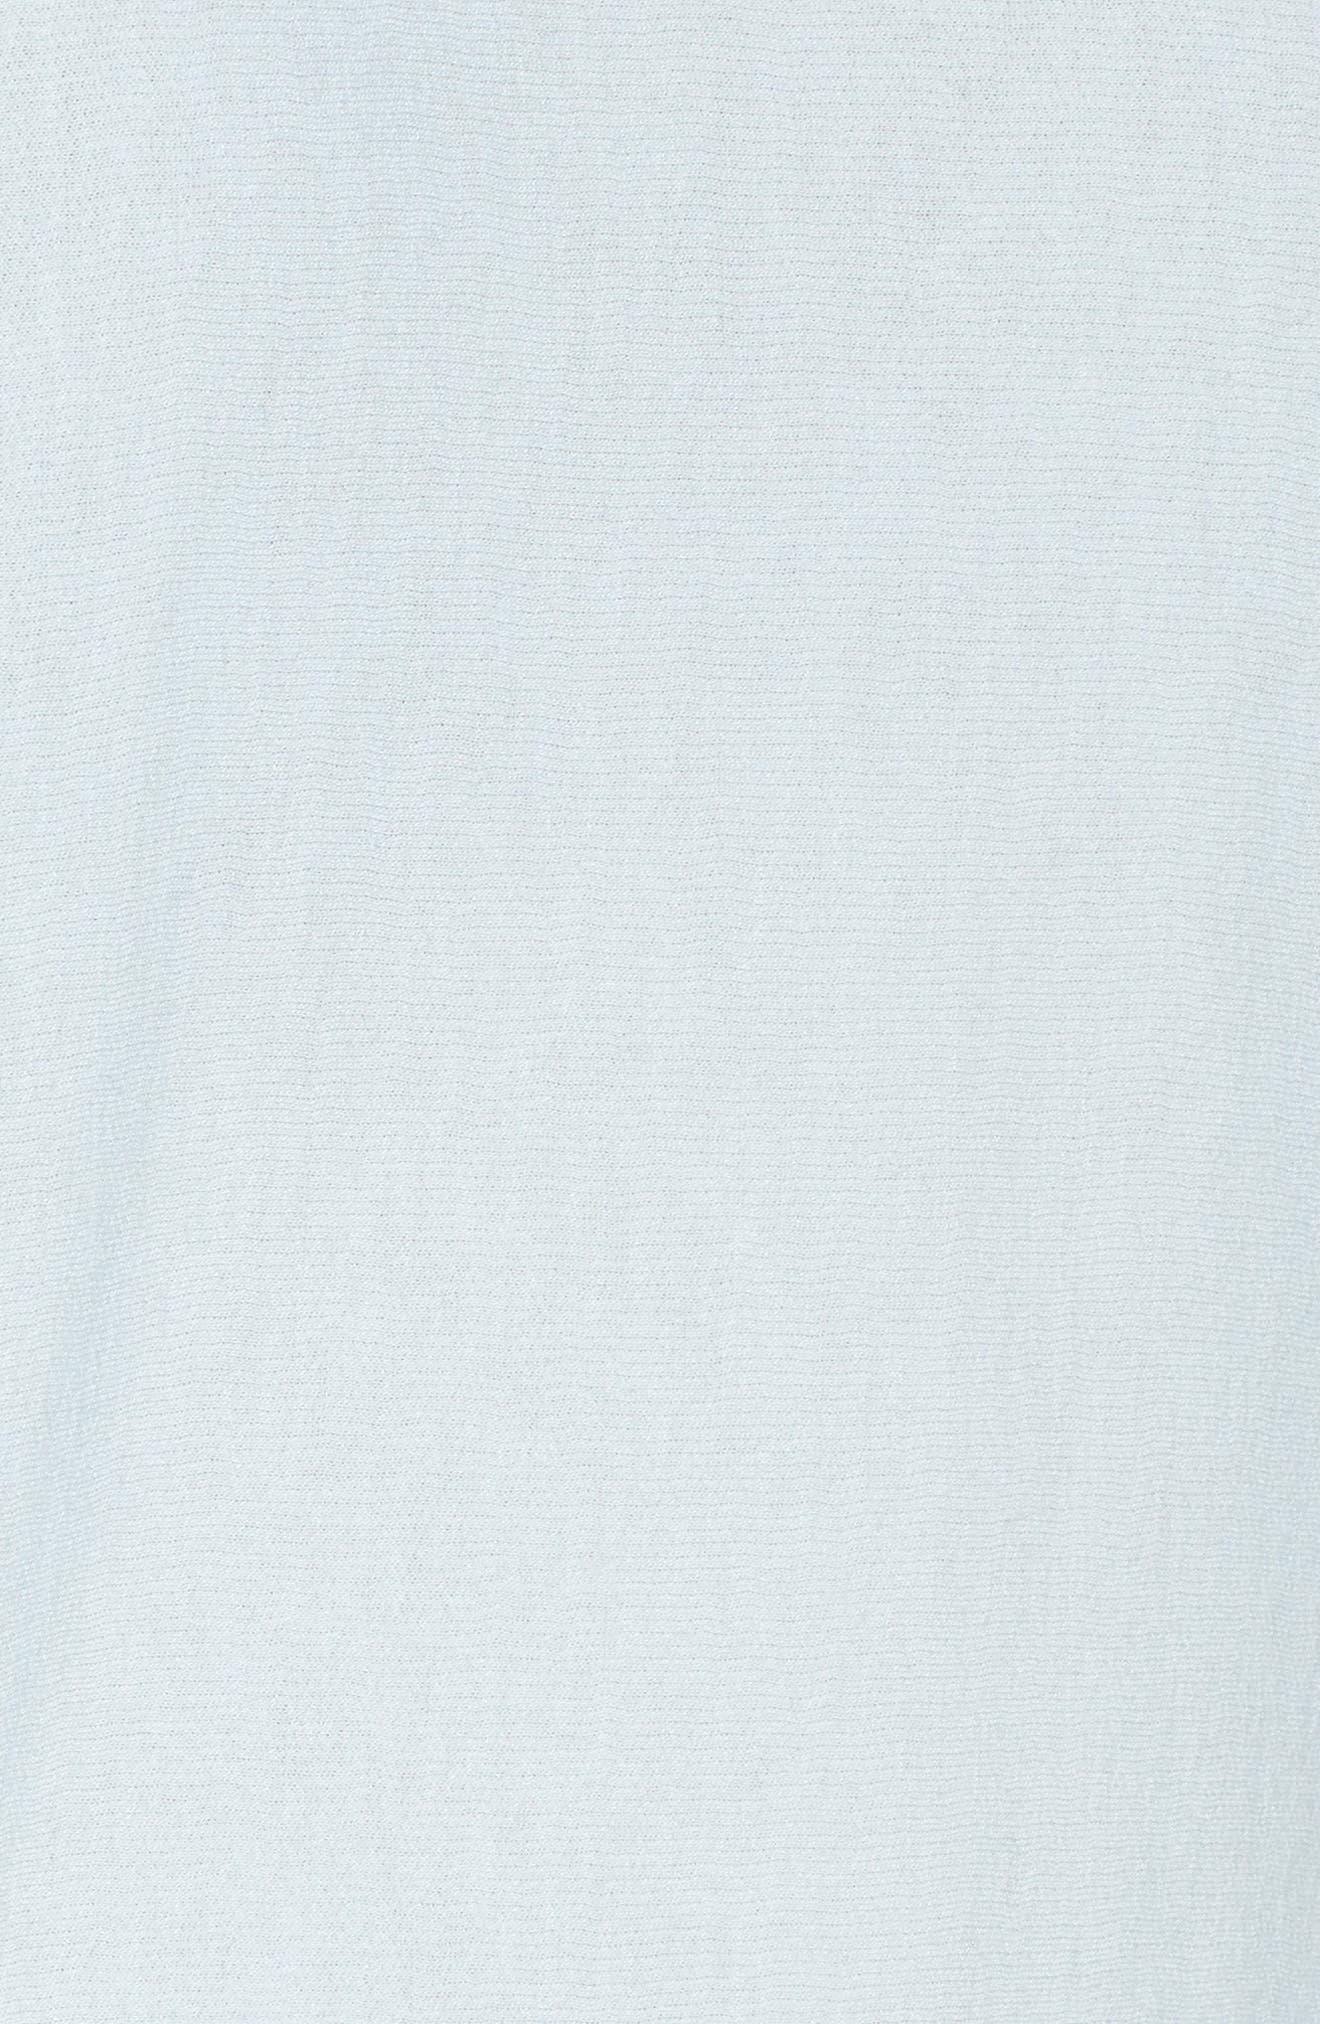 Ruched Sleeve Sweatshirt,                             Alternate thumbnail 5, color,                             Light Blue